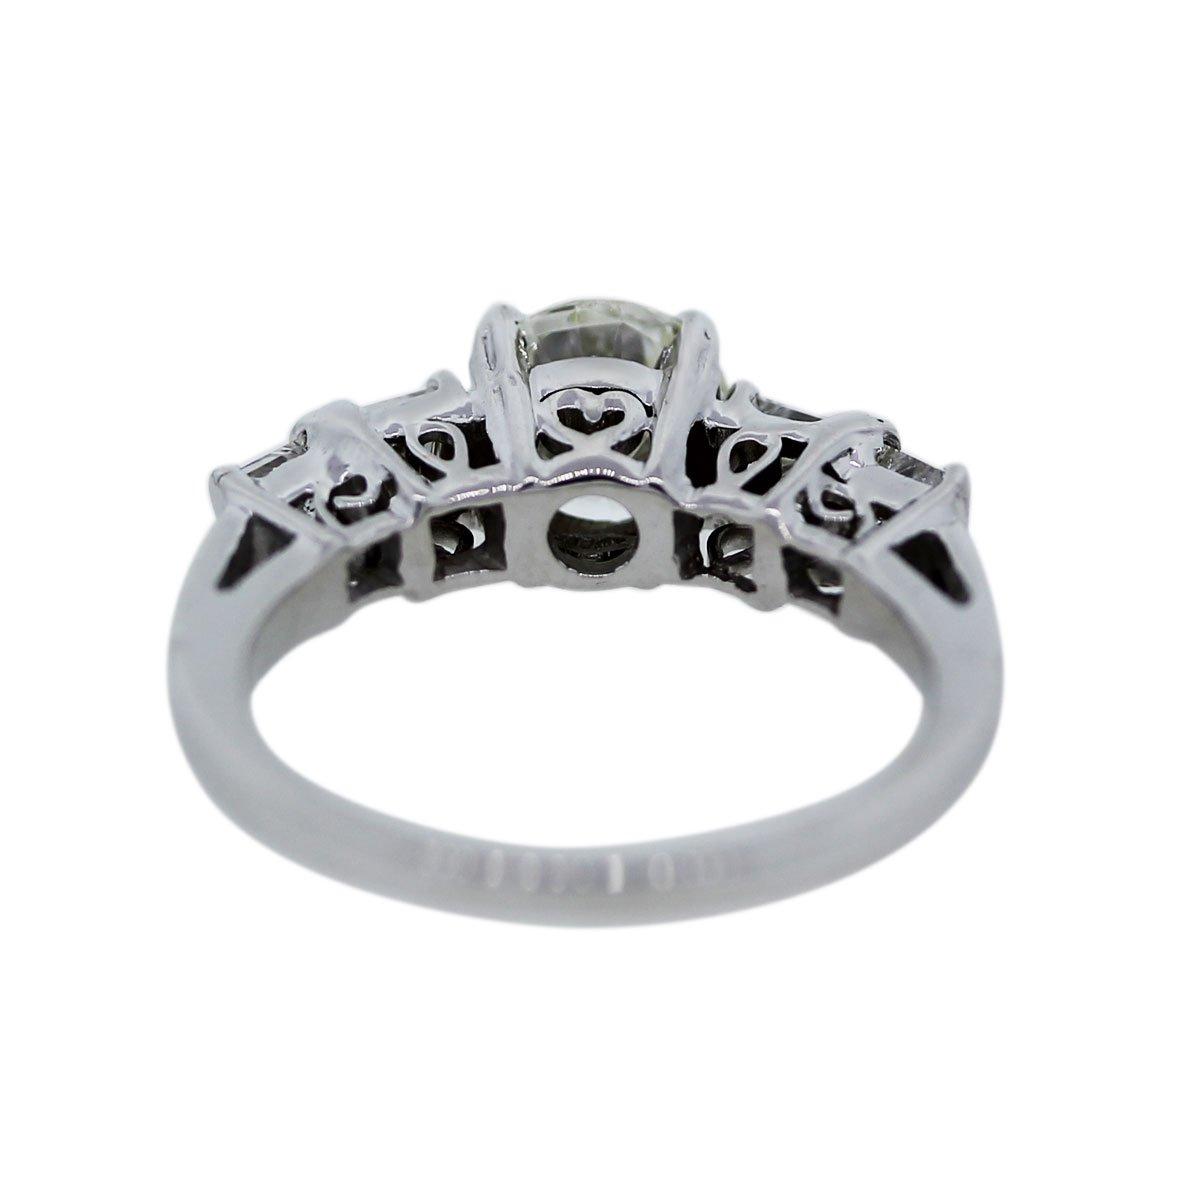 His And Hers Platinum Wedding Rings 96 Superb Image via raymondleejewelers net